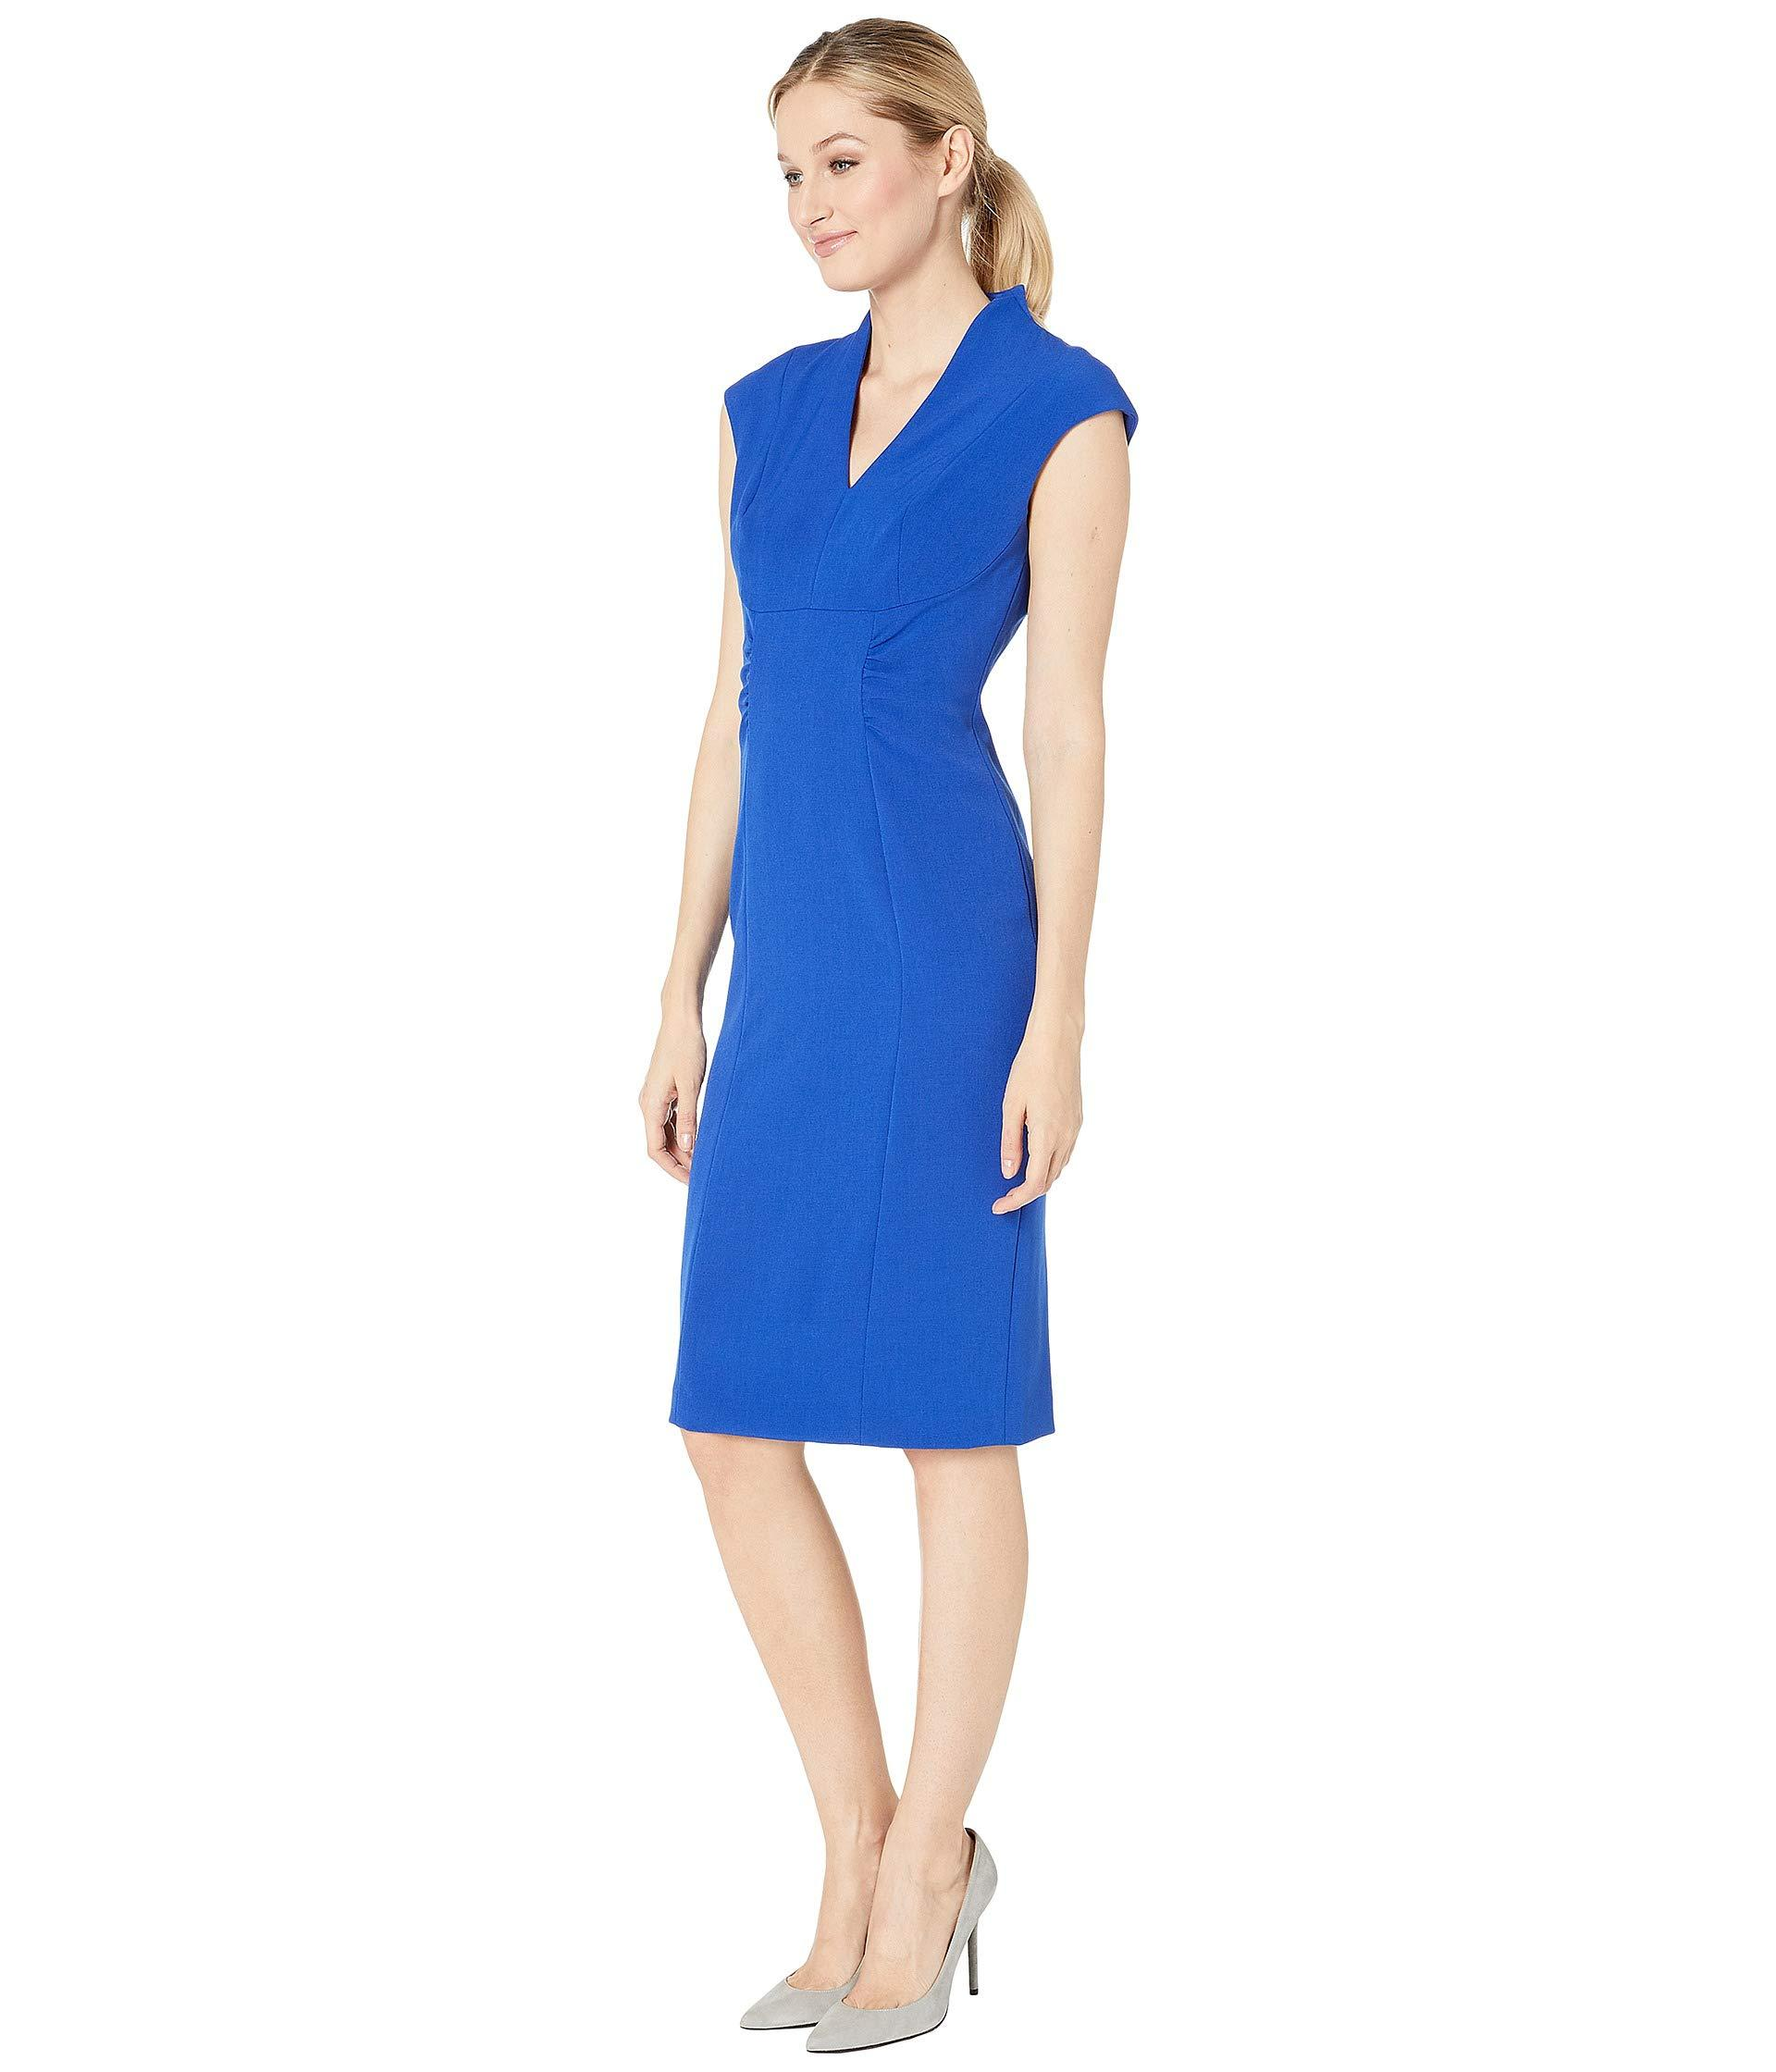 5976c30ef4f65 Lyst - Tahari Cap Sleeve Stretch Crepe Side Shirred Dress (spring Royal  Royal) Women's Dress in Blue